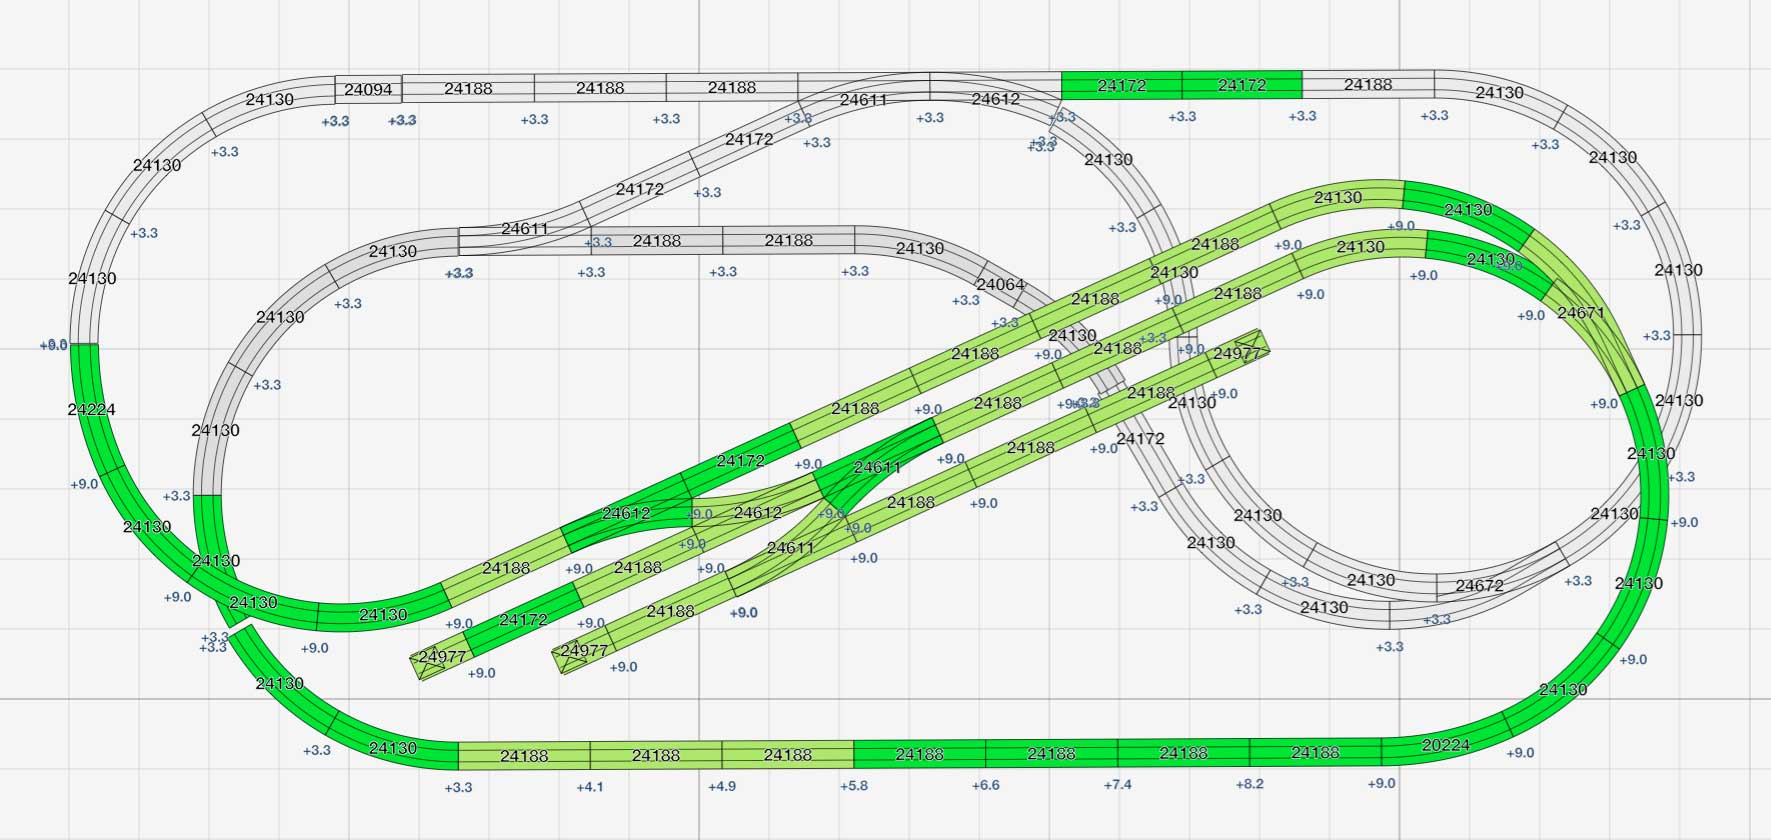 Gleisplan-H0-maerklin-c-gleis-2,5mx1,2m-001 3